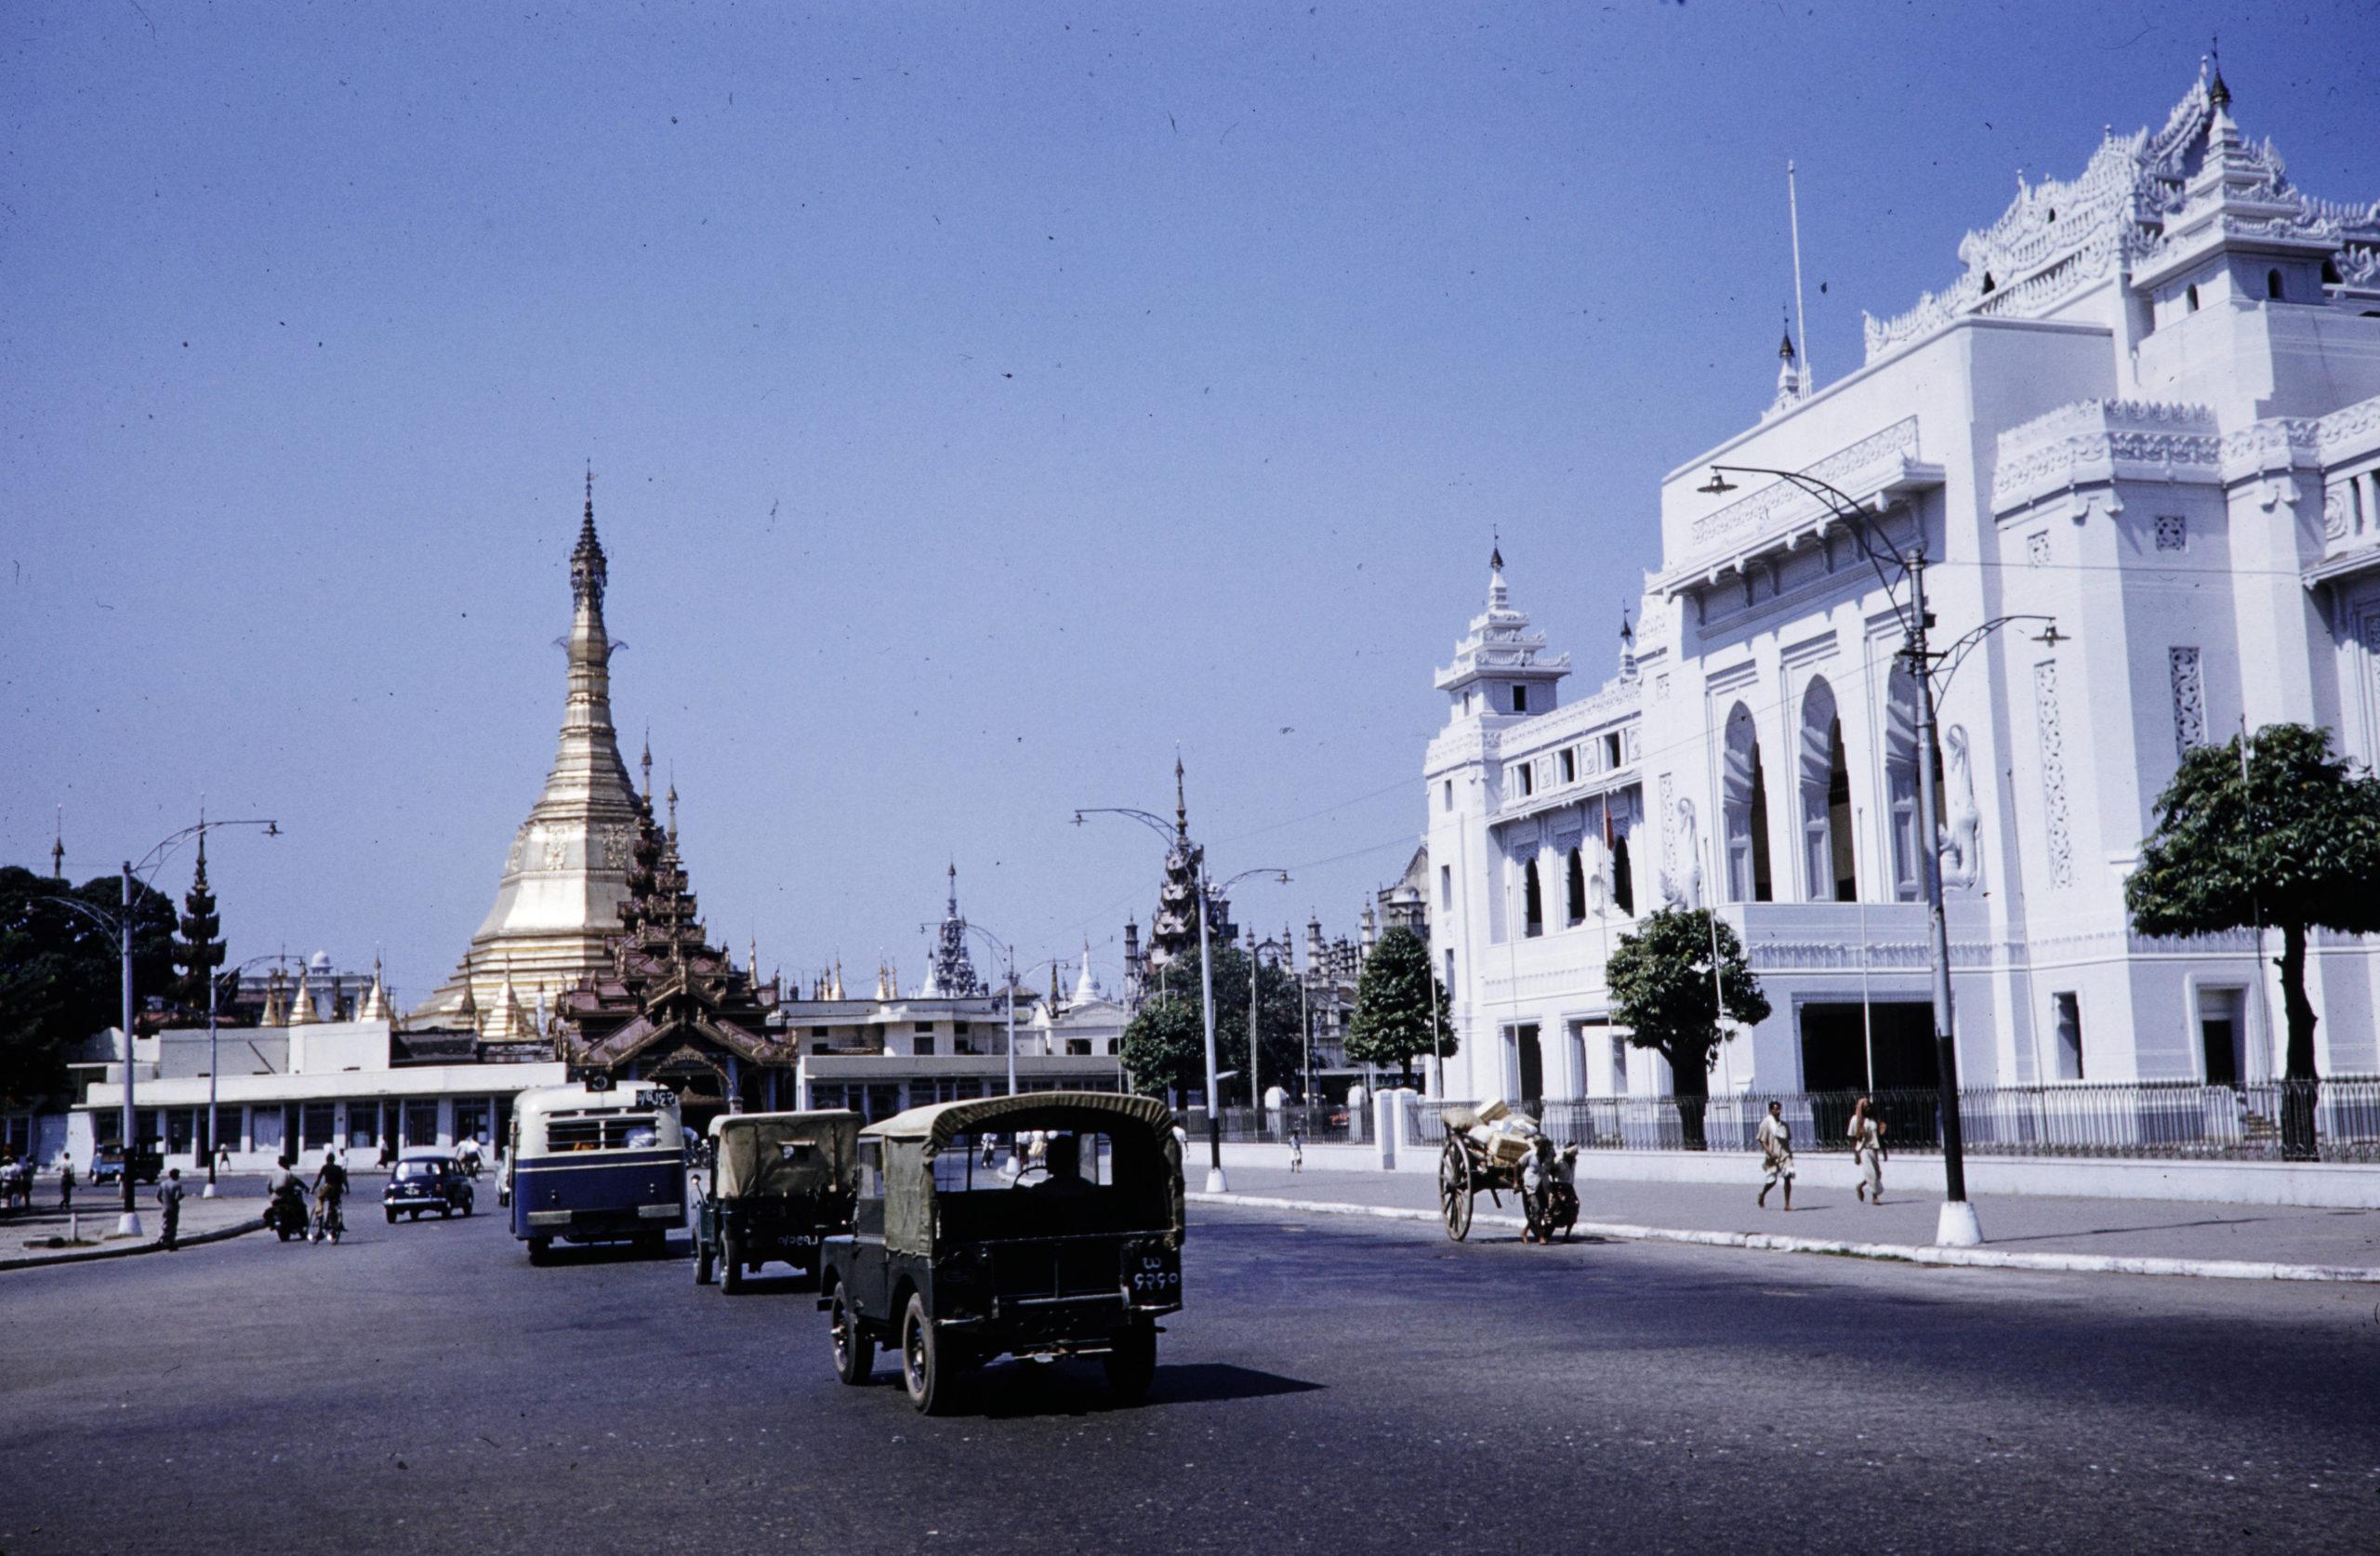 [Photos] Archive shots of pre-coup 1960s Rangoon and Mandalay